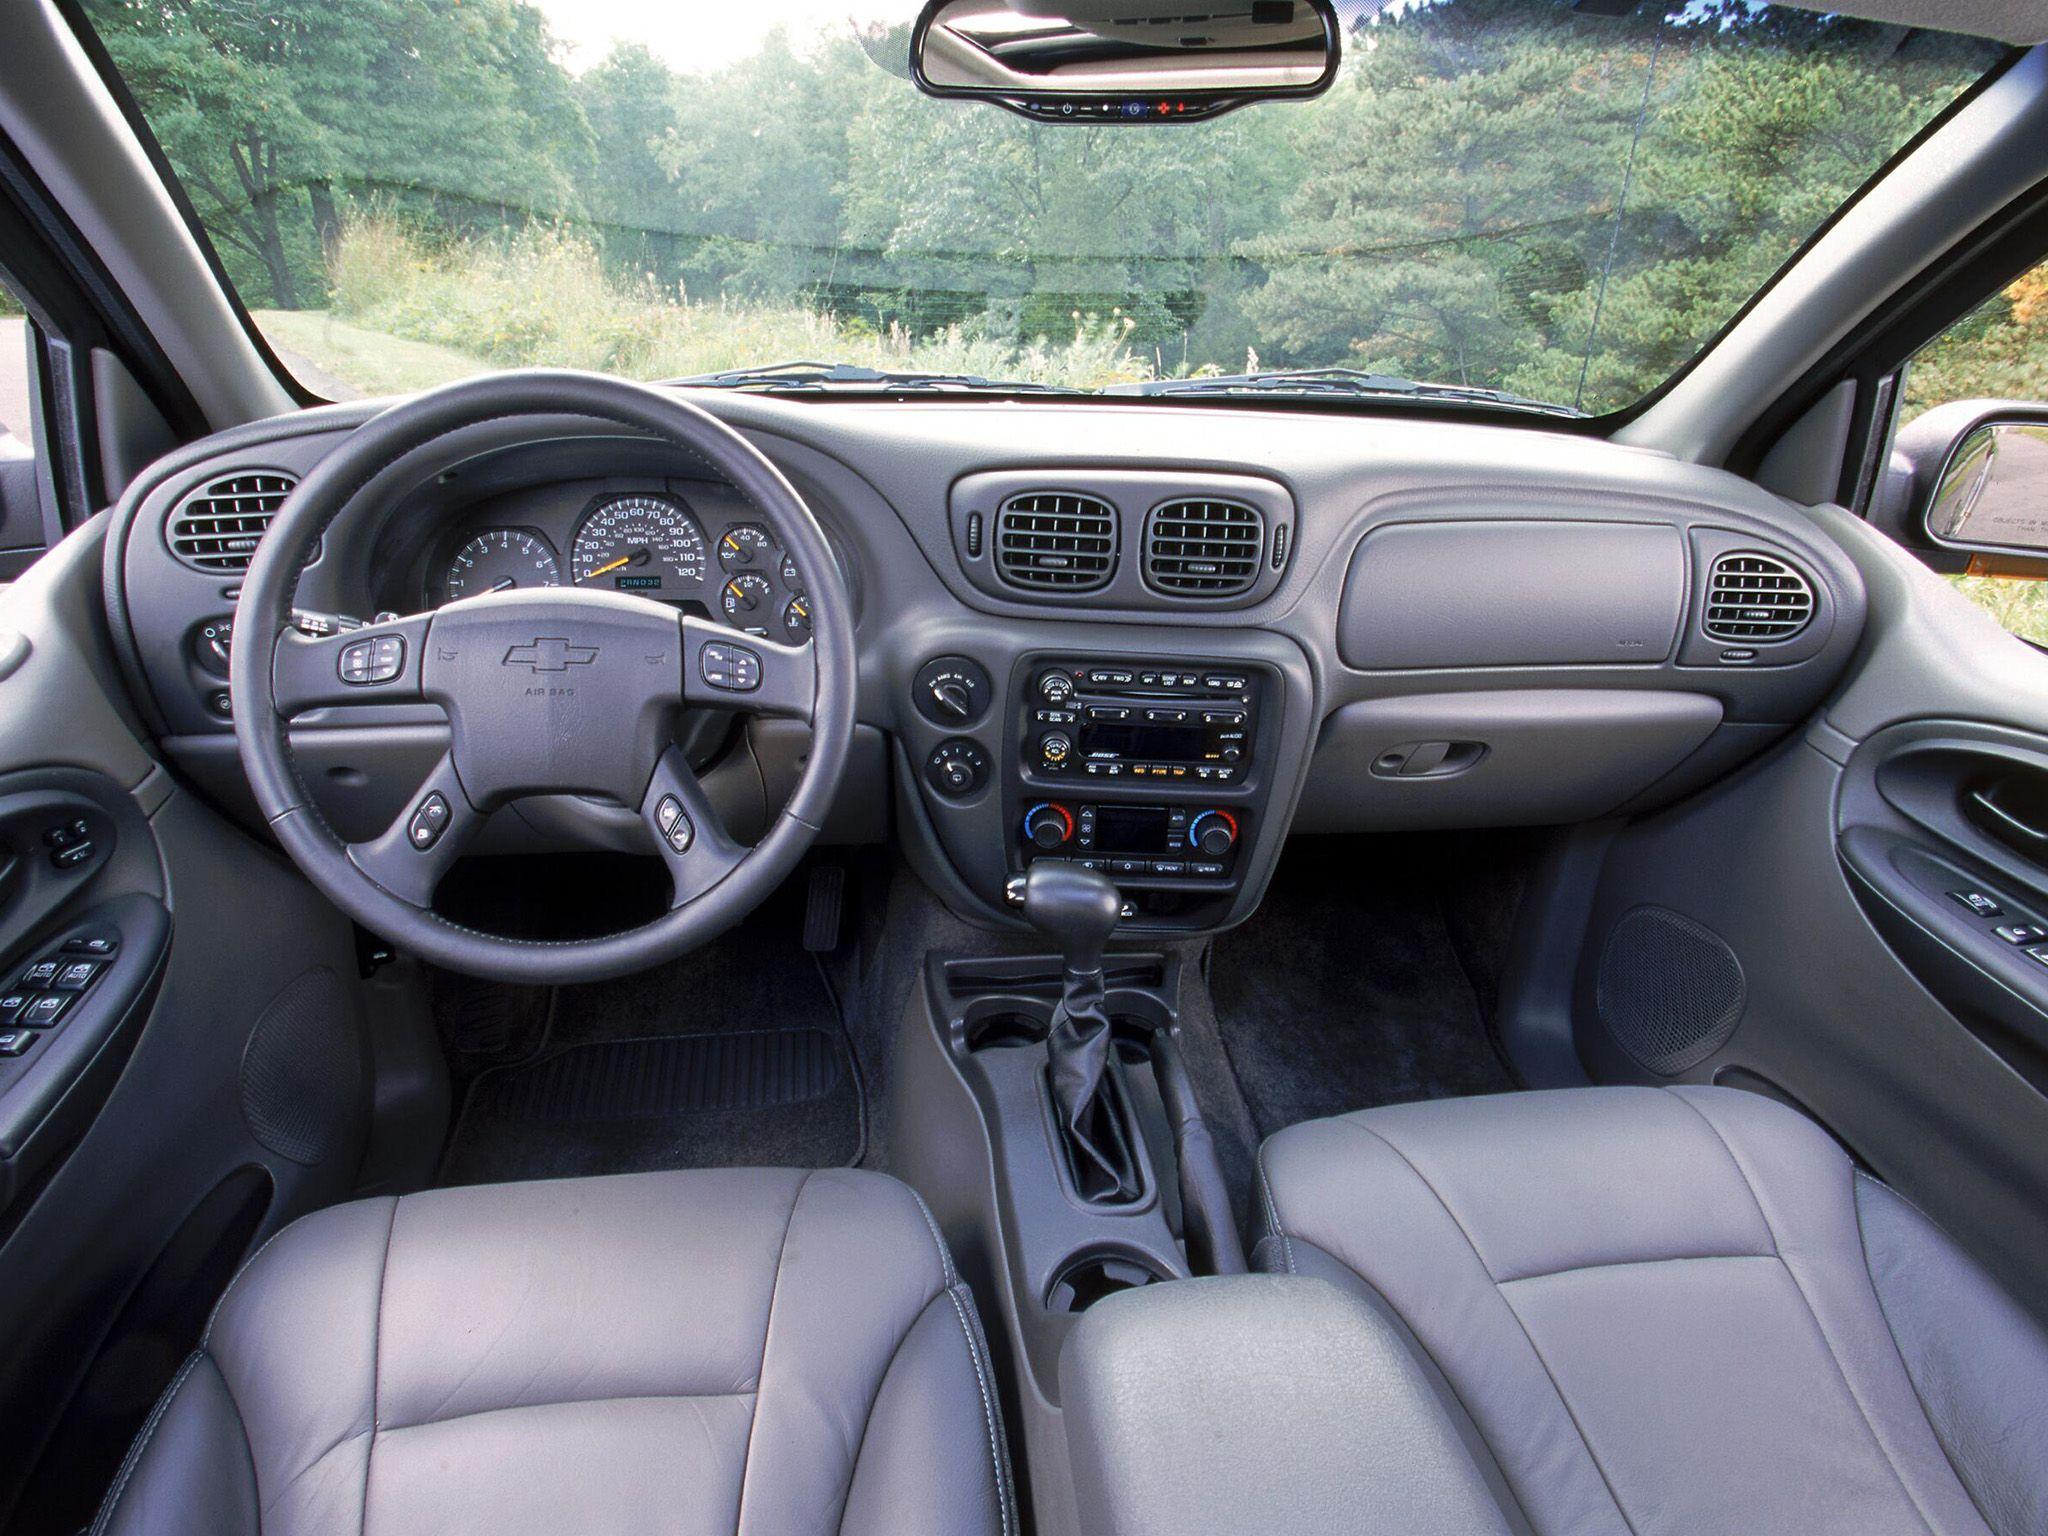 2003 Chevrolet Trailblazer Interior And Dashboard Pinterest Chevrolet Trailblazer